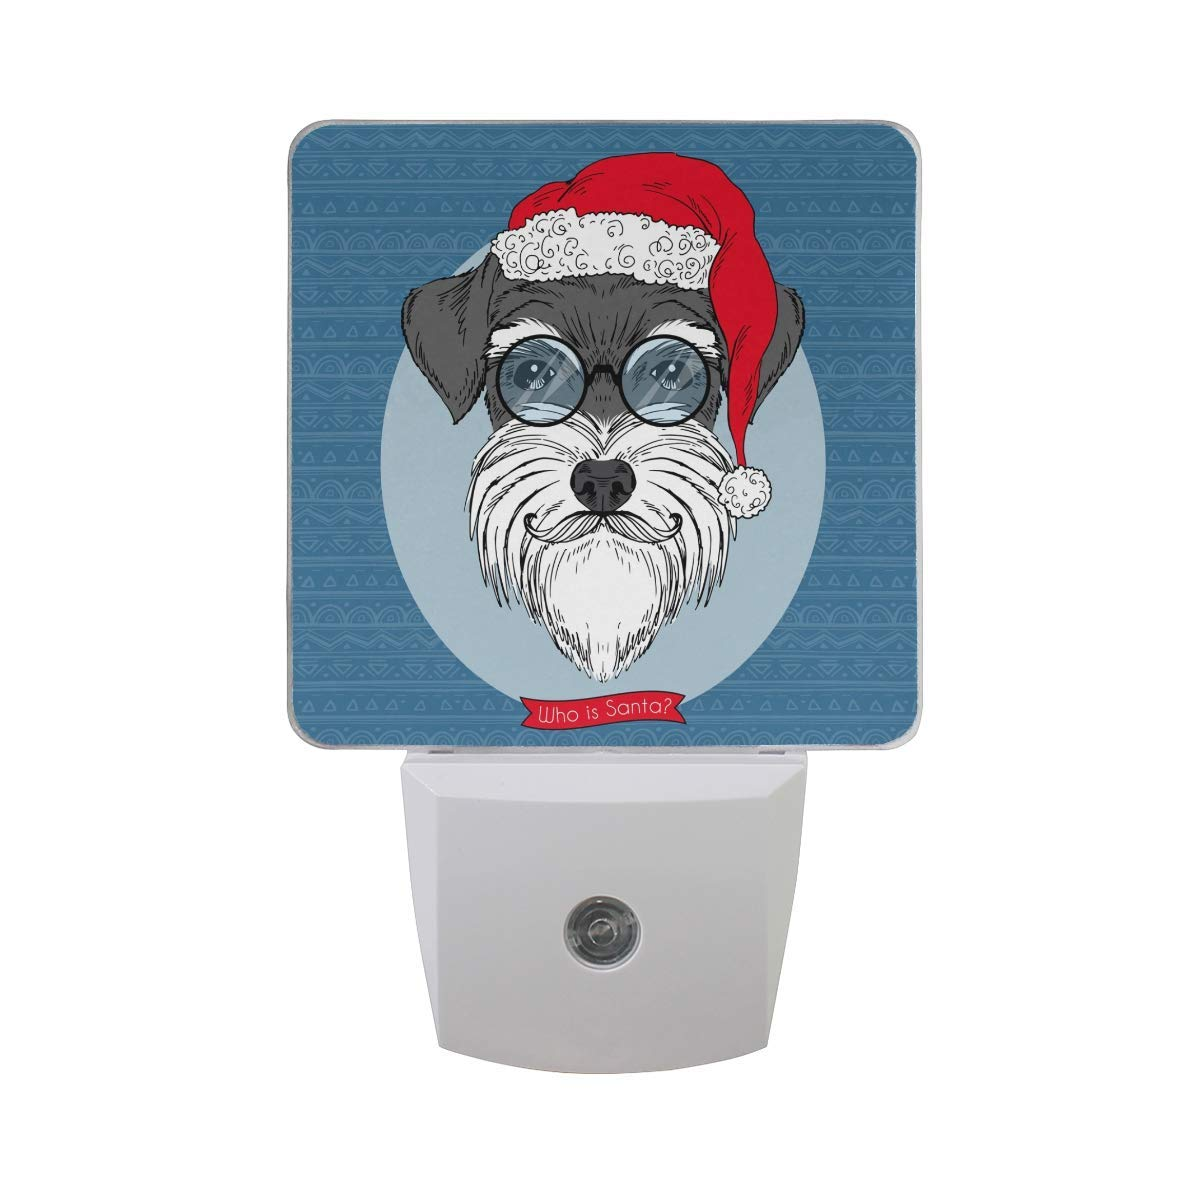 WIHVE Christmas Santa Schnauzer 2 Pack 0.5W Plug-in LED Night Light Lamp with Dusk to Dawn Sensor, Night Home Decor Bed Lamp